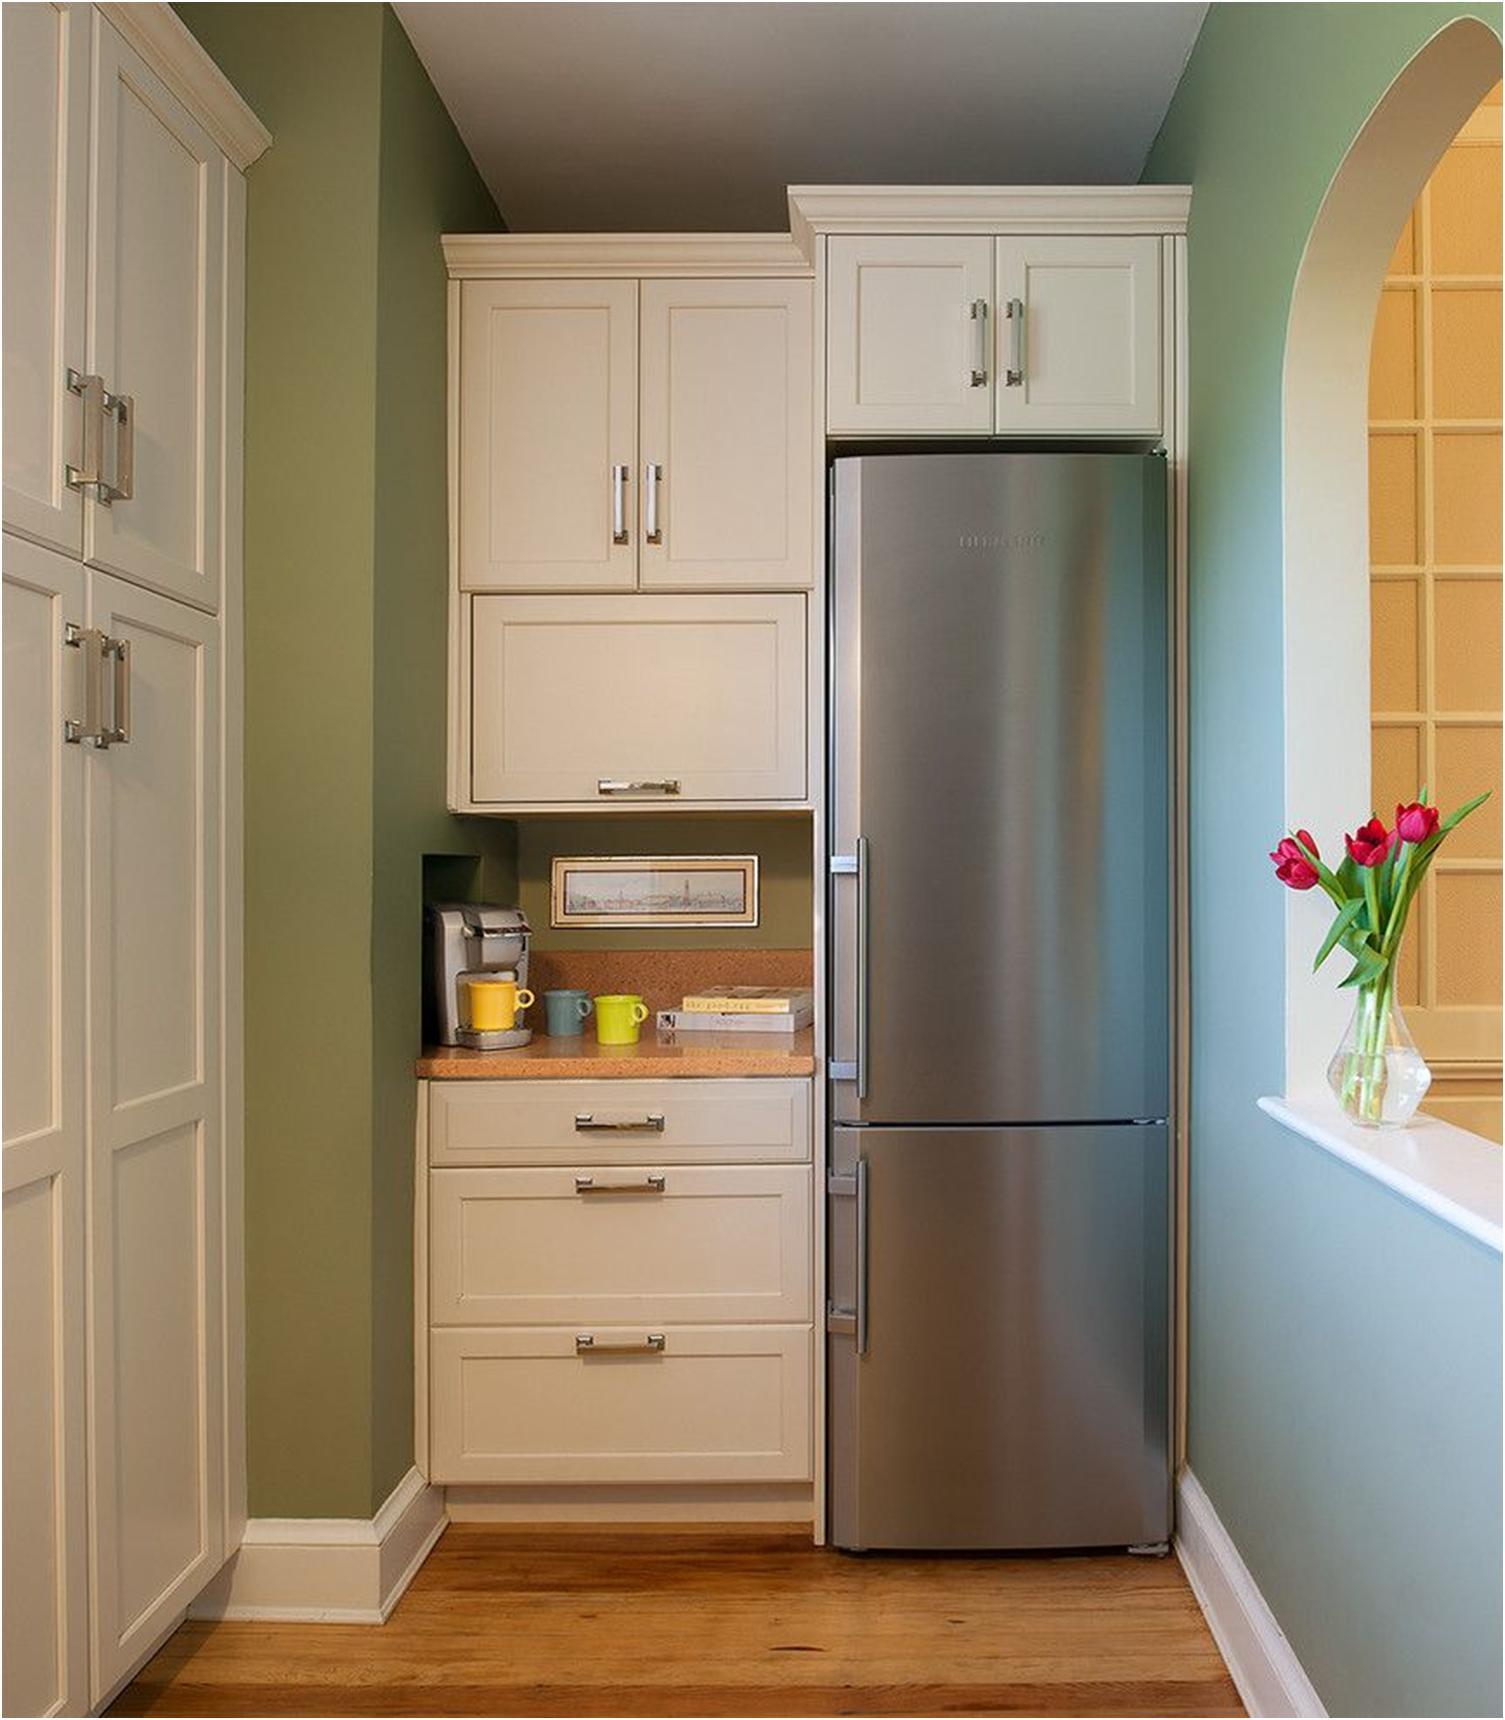 Балкон, кухонные шкафы.